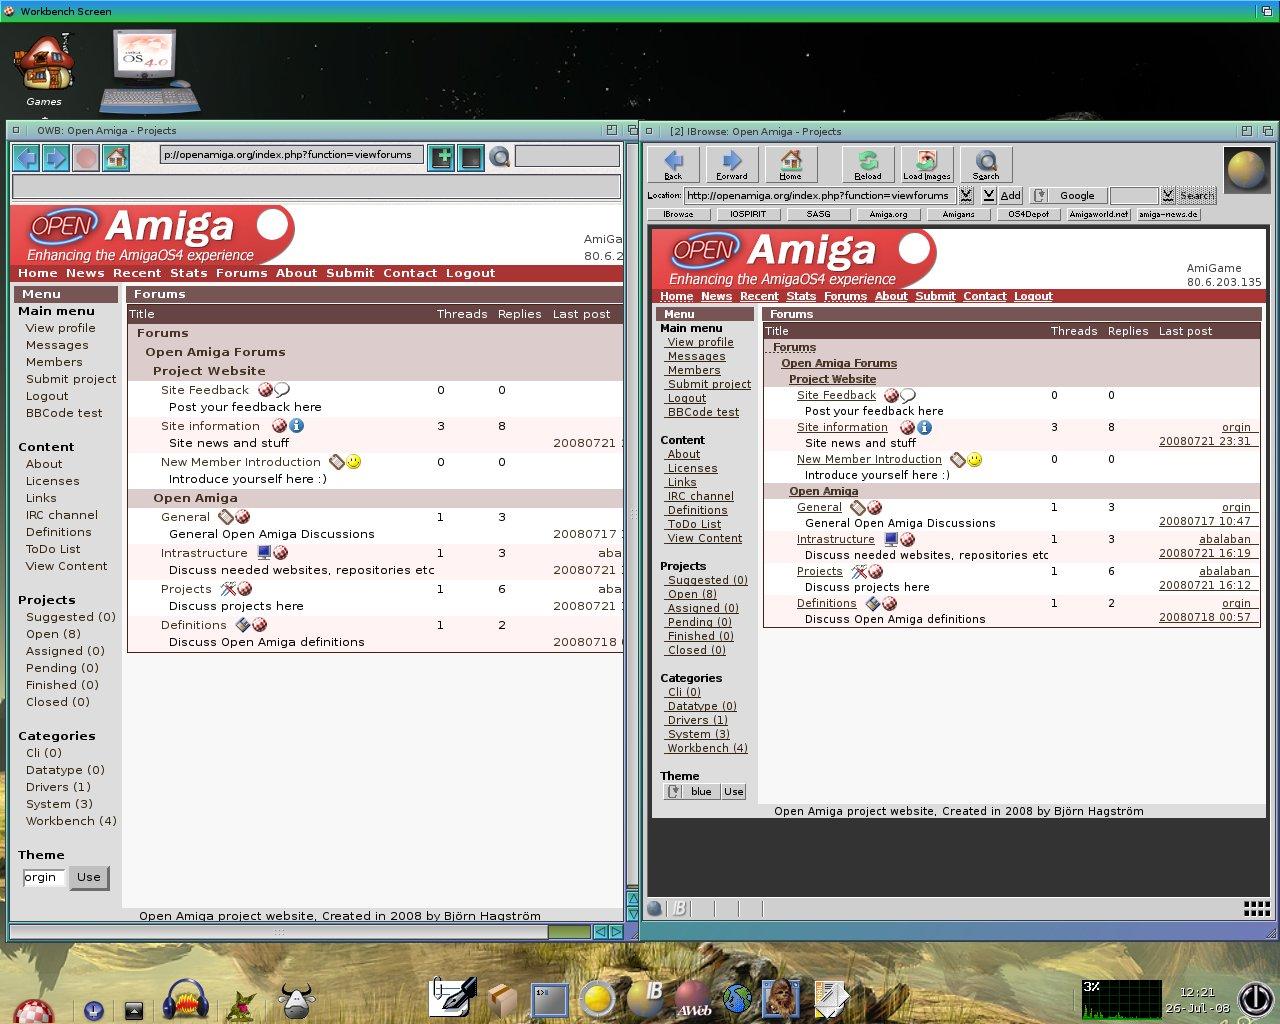 OWB 1.24 vs IBrowse 2.4